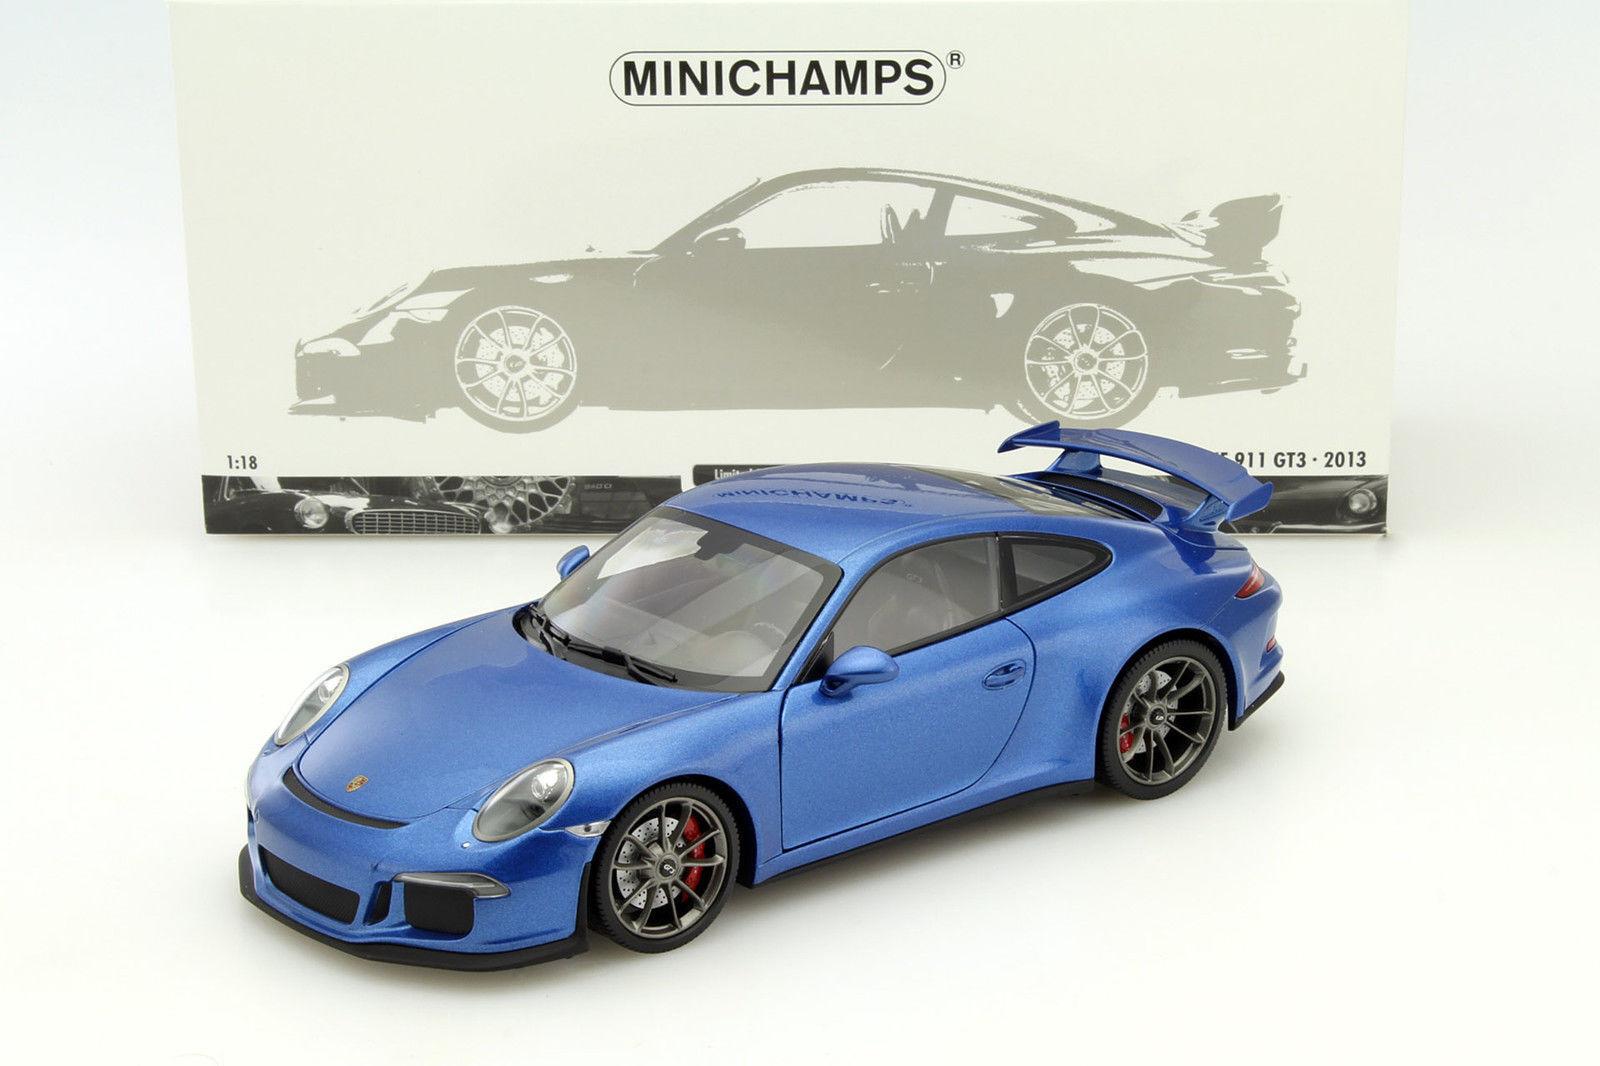 almacén al por mayor Minichamps 2013 Porsche 911 991 GT3 Azul Azul Azul Metálico 1 18 artículo raro le 300 un.New  sin mínimo